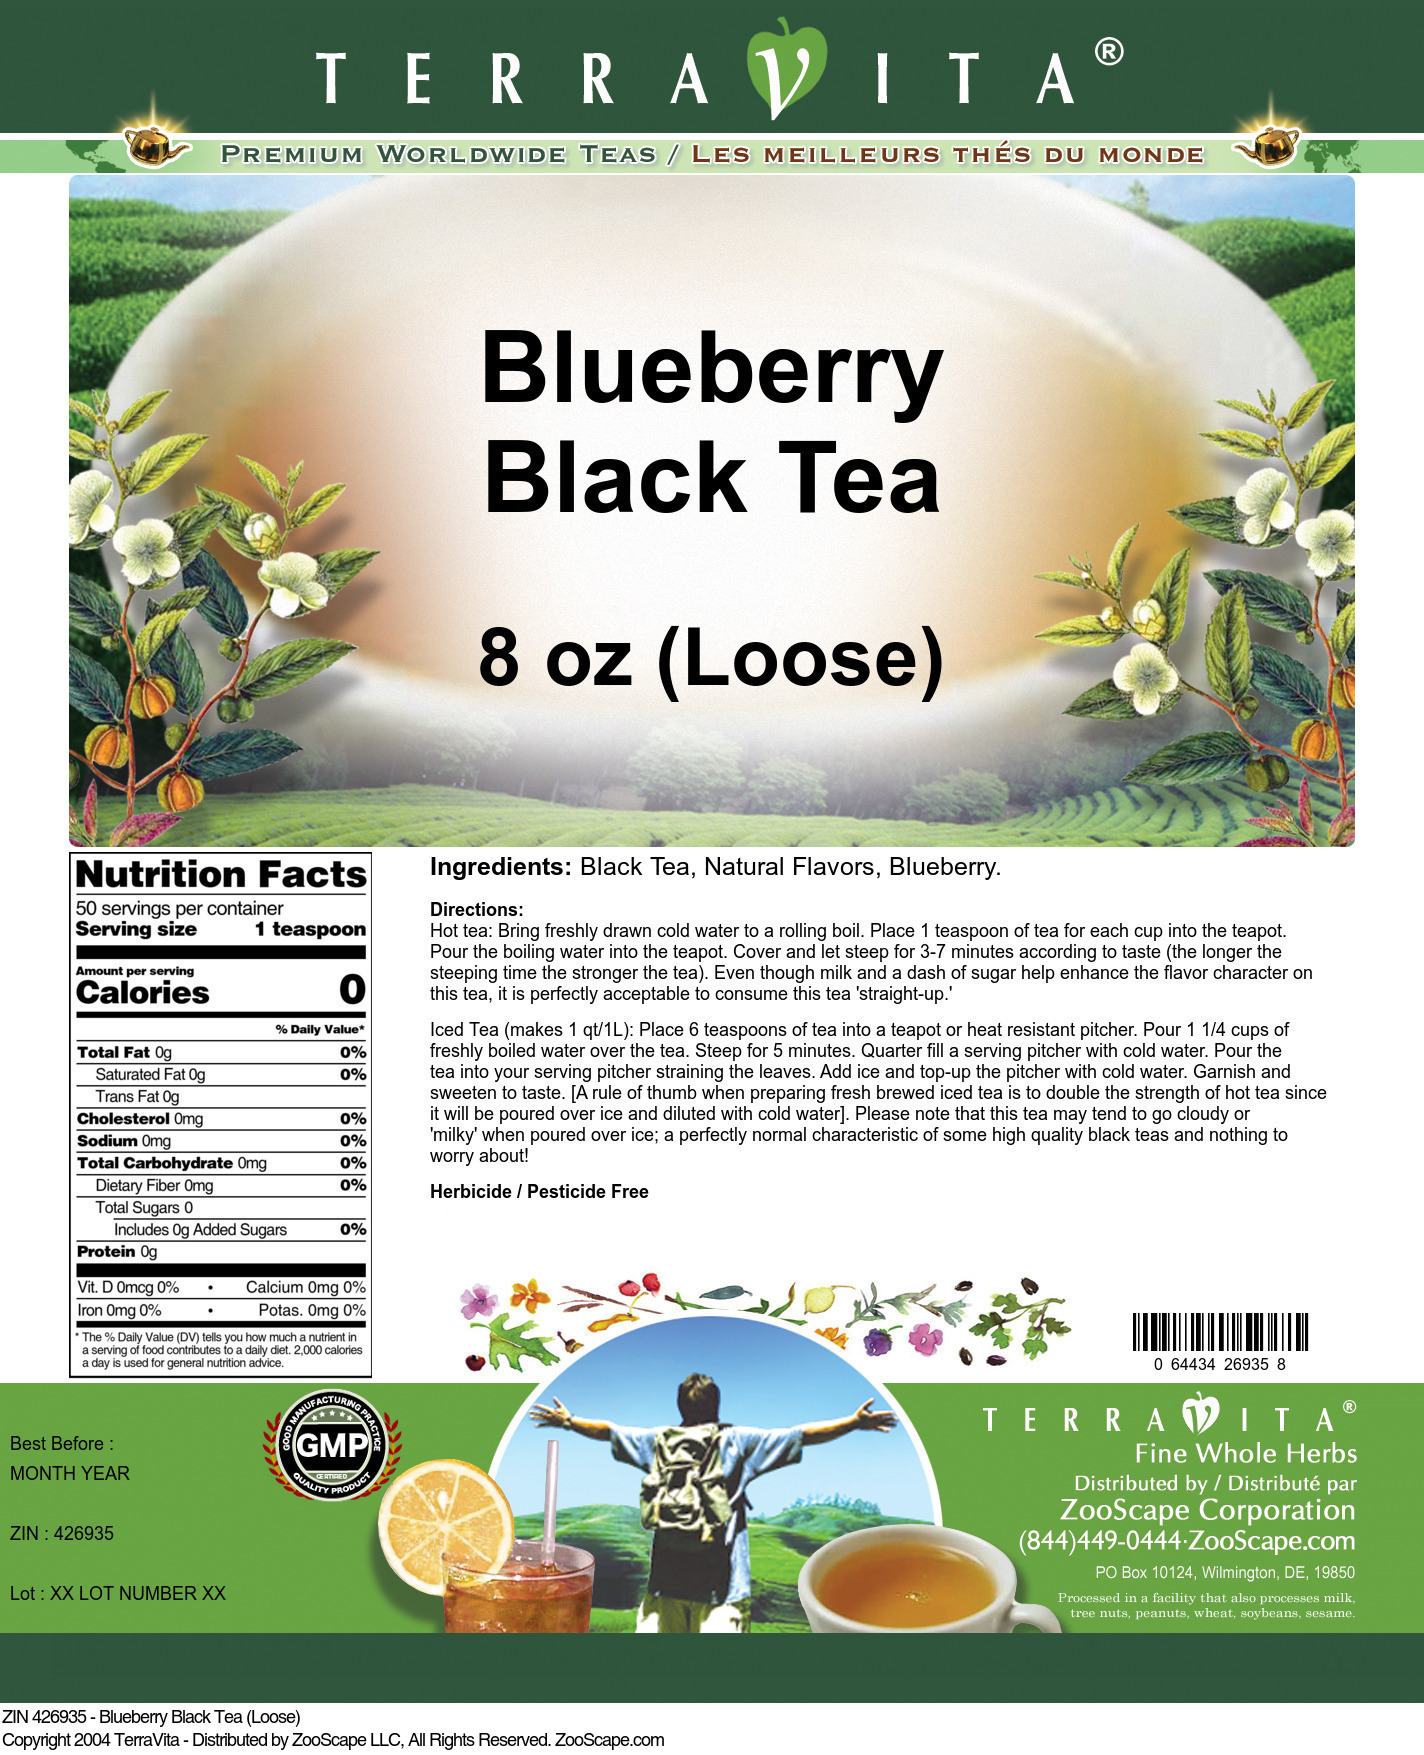 Blueberry Black Tea (Loose)